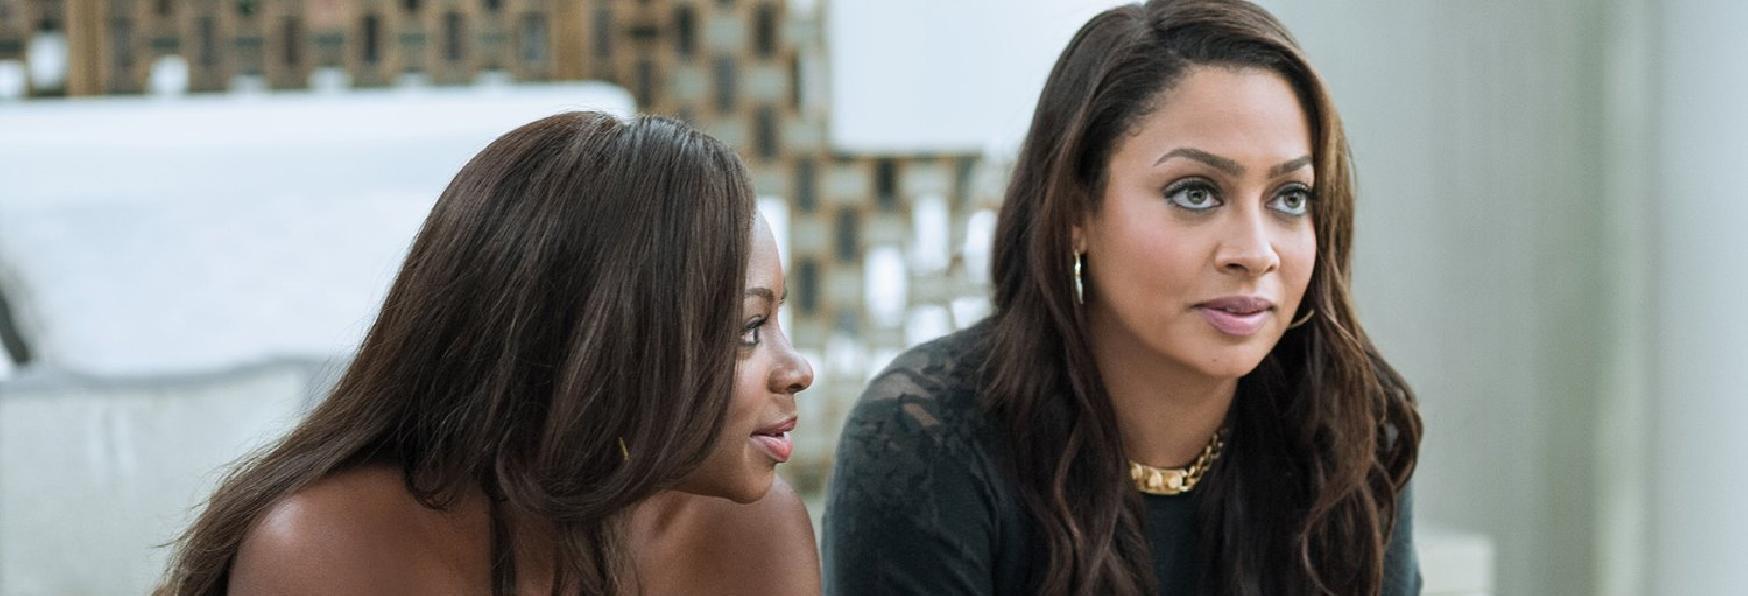 90210: La La Anthony entra nel Cast del Revival di Beverly Hills